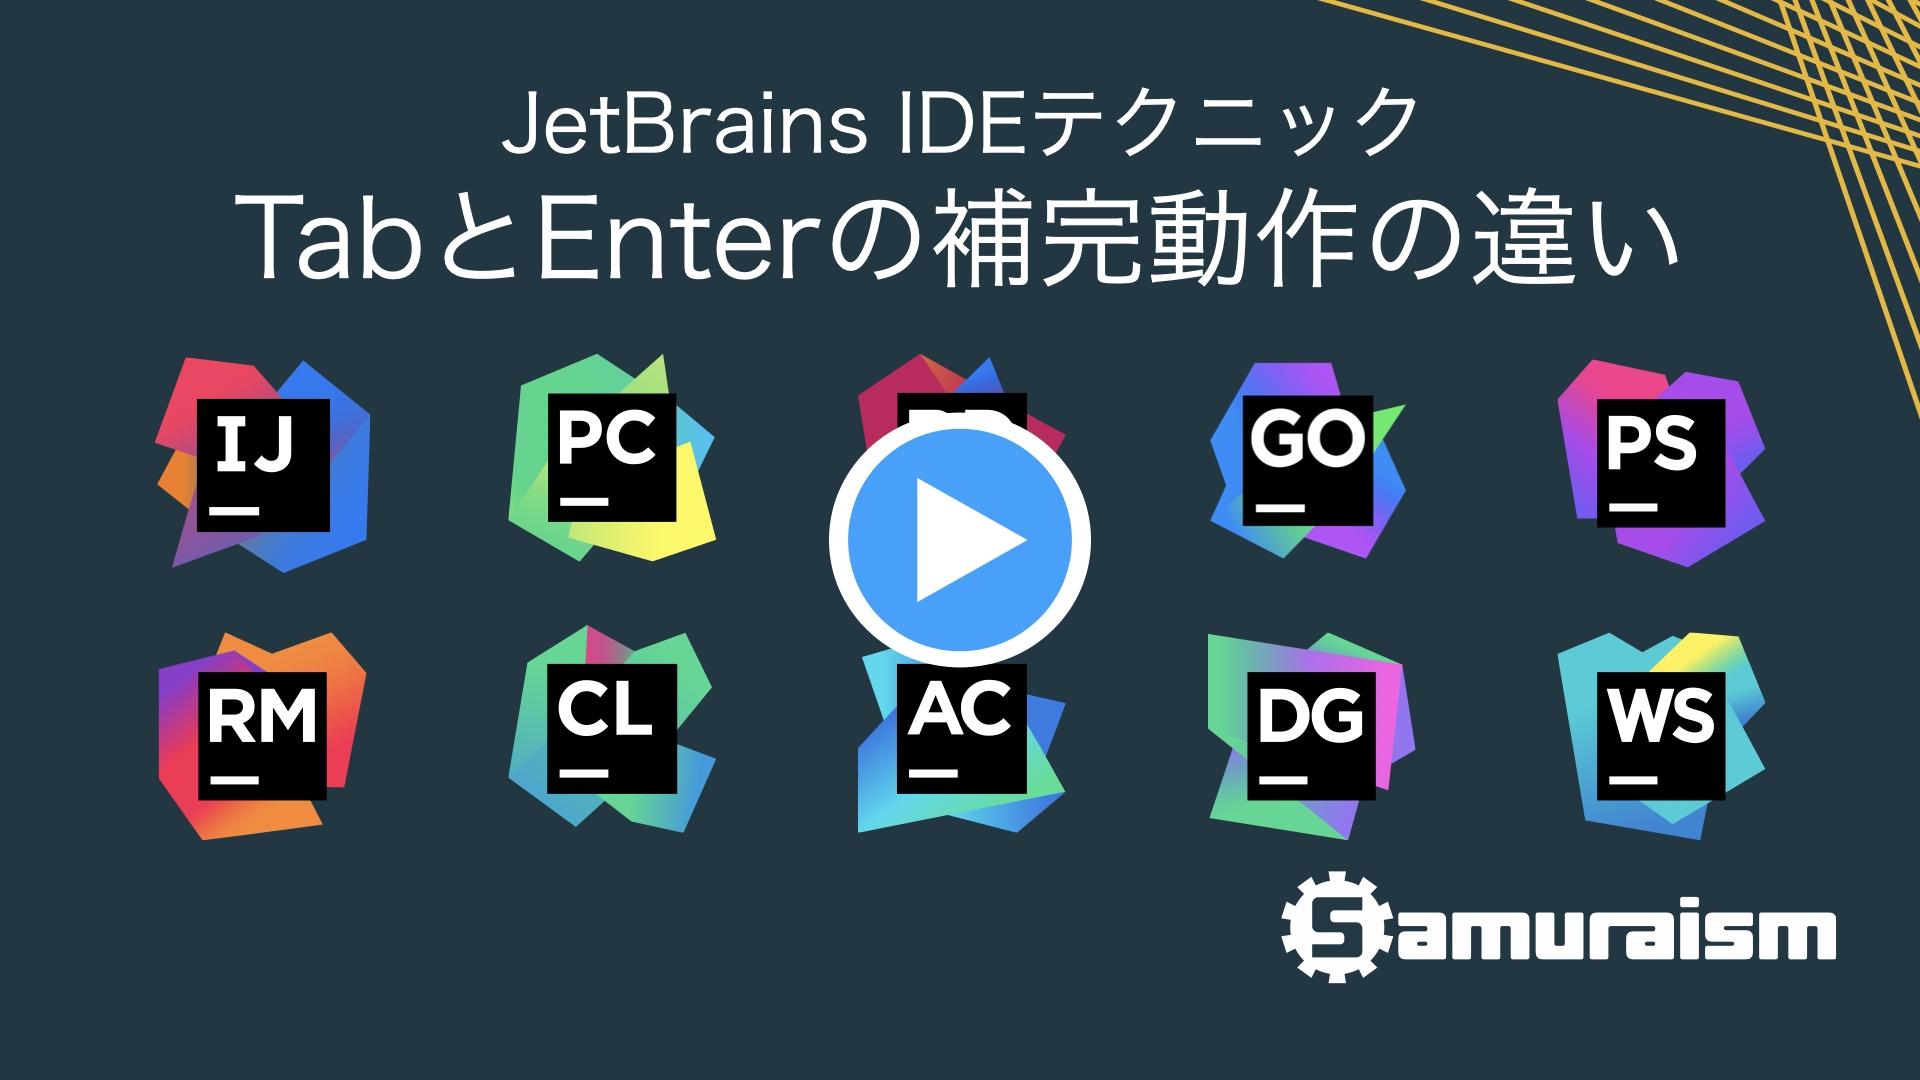 #JetBrainsIDEテクニック – TabとEnterの補完動作の違い